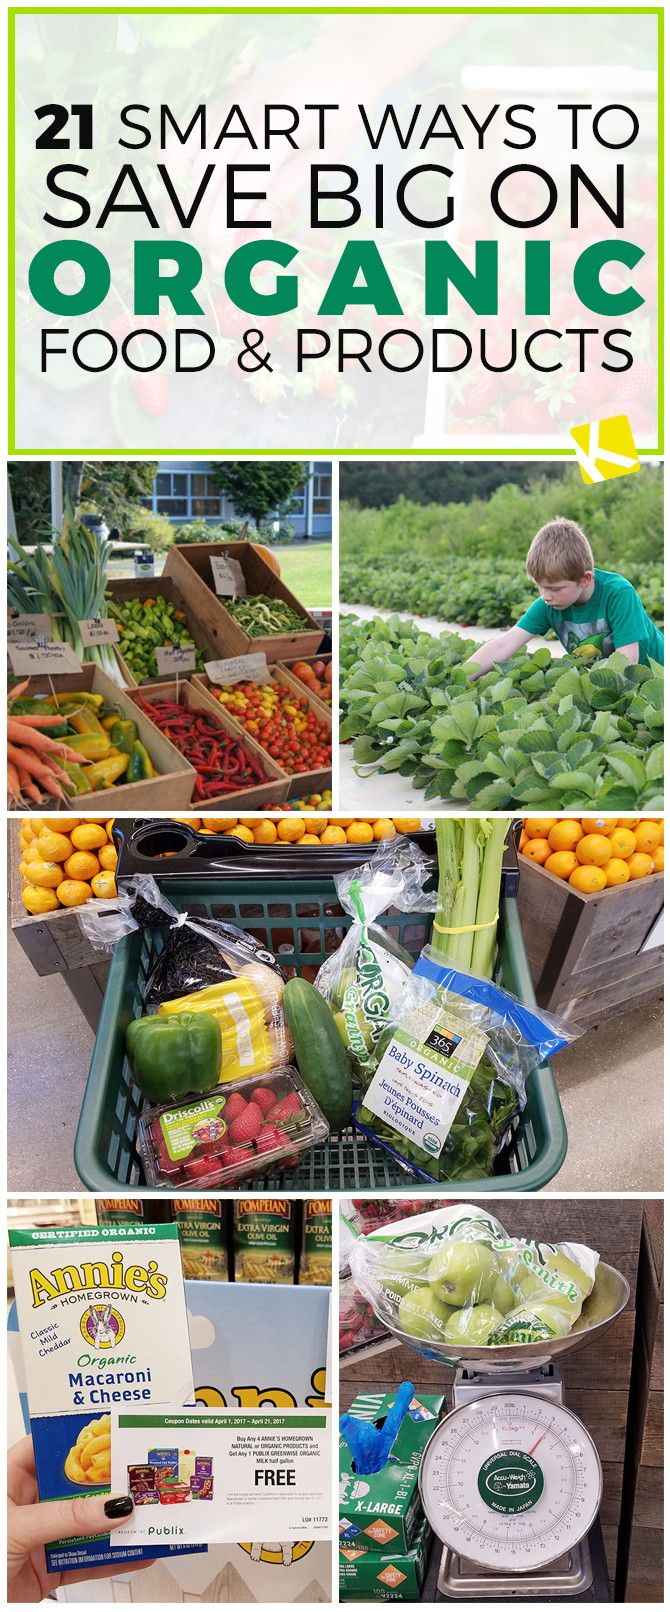 21 Smart Ways to Save Big on Organic Food & Products